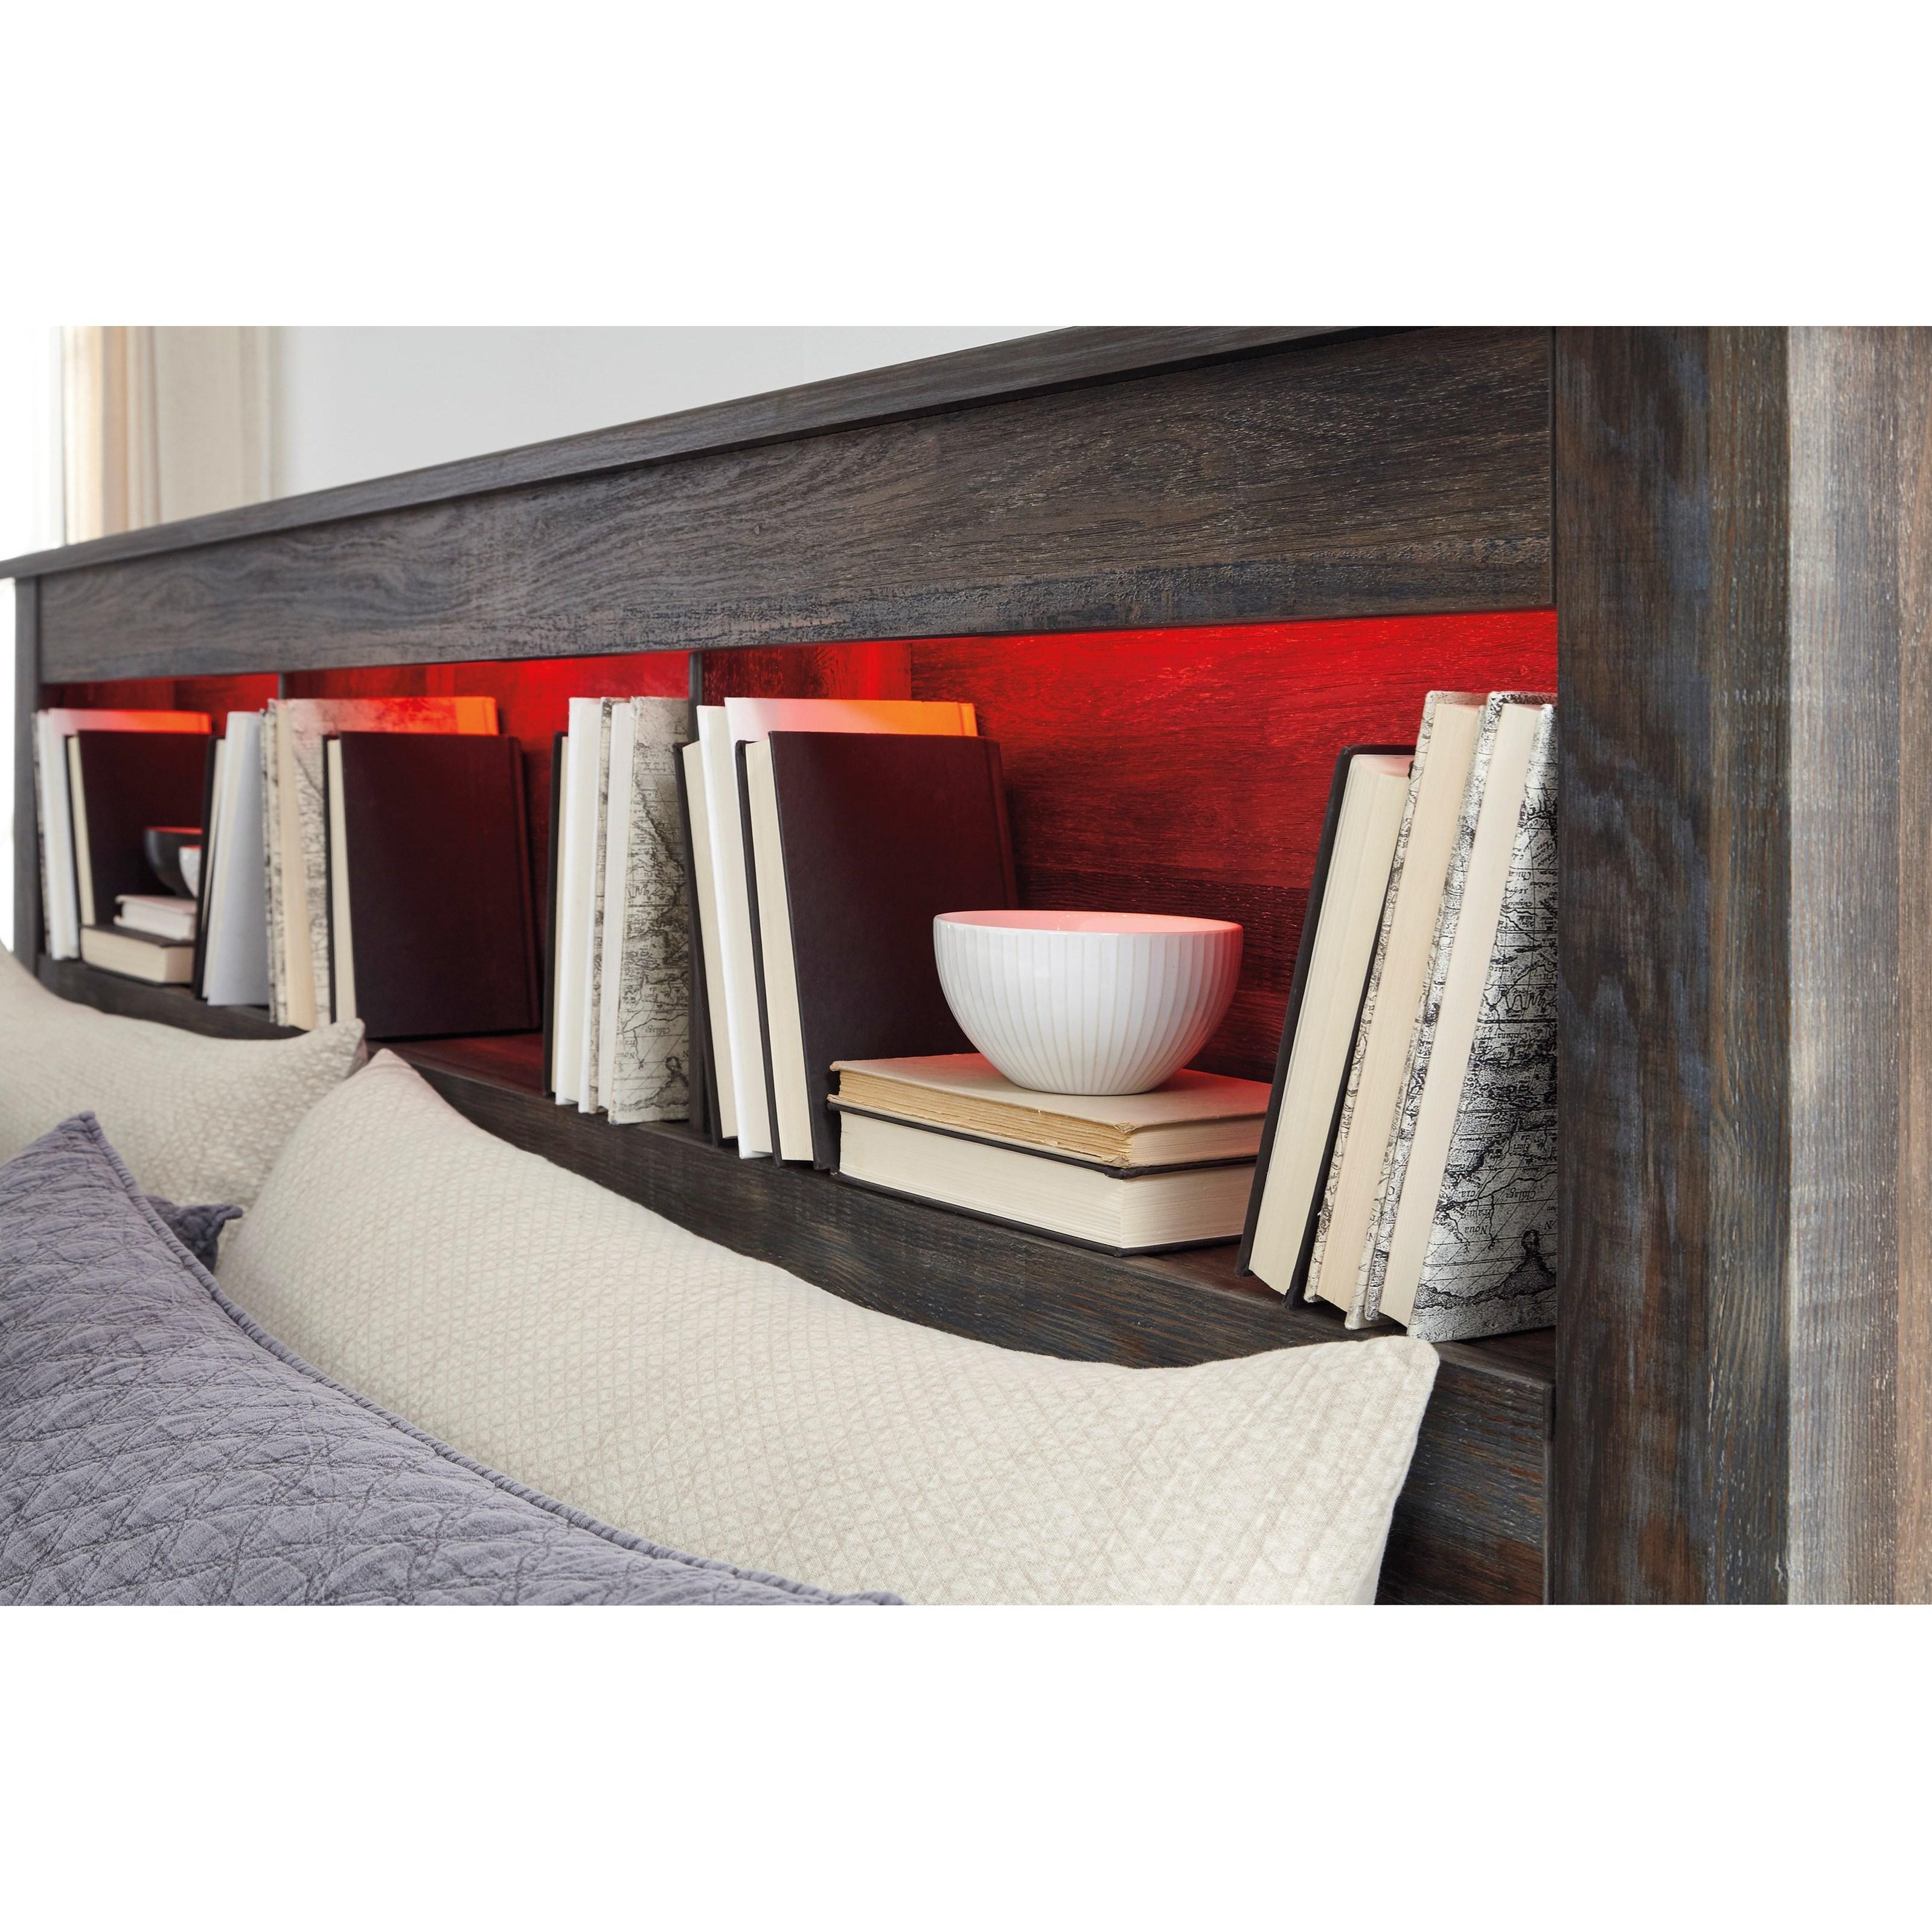 Cal King Bookcase Headboard: StyleLine Drystan B211-69 King/California King Bookcase